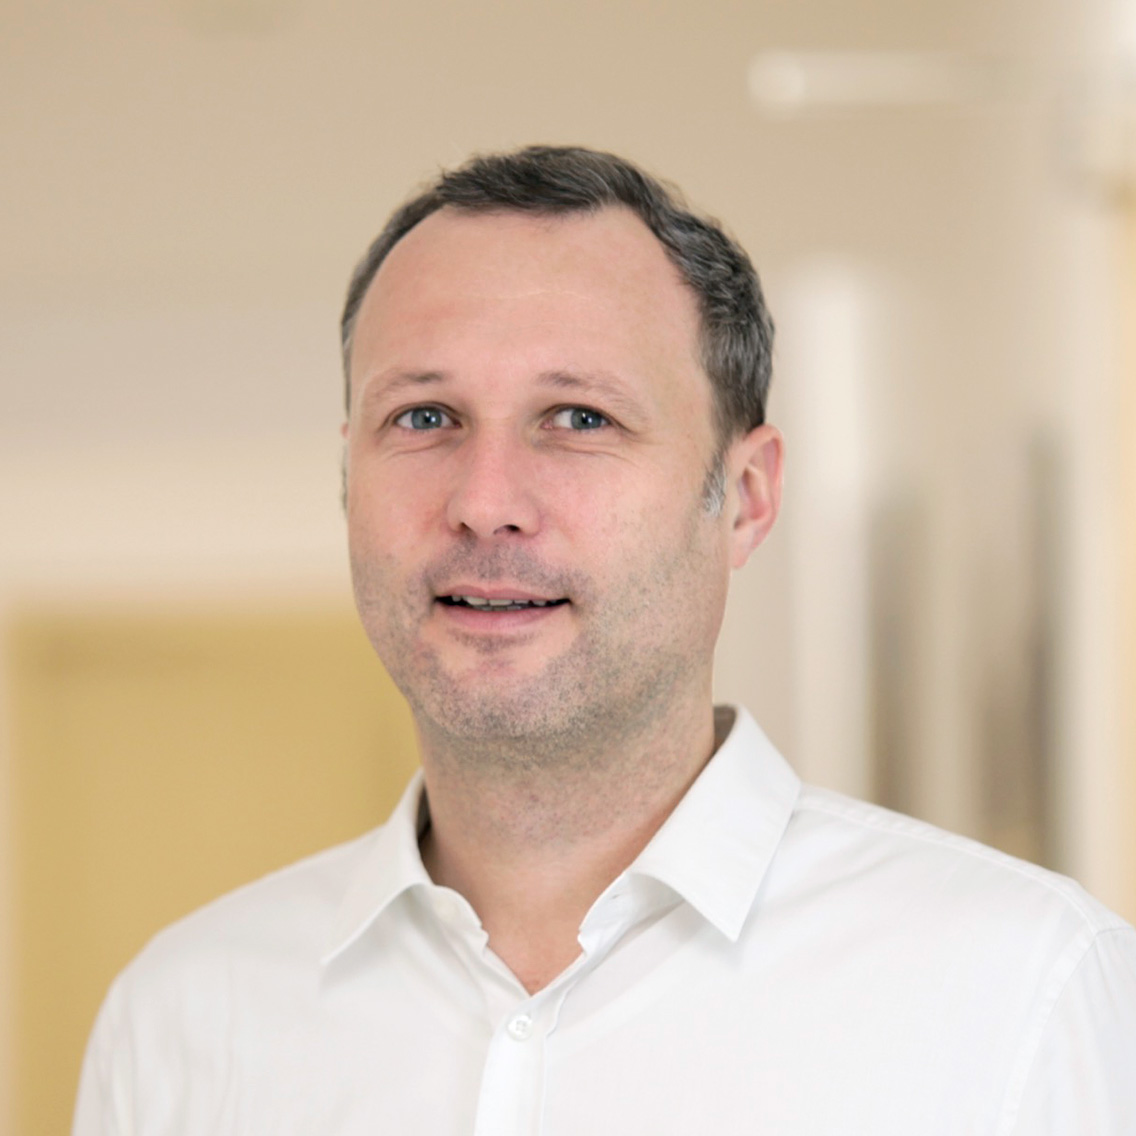 Prof. Dr. rer. medic. Patrick Jahn